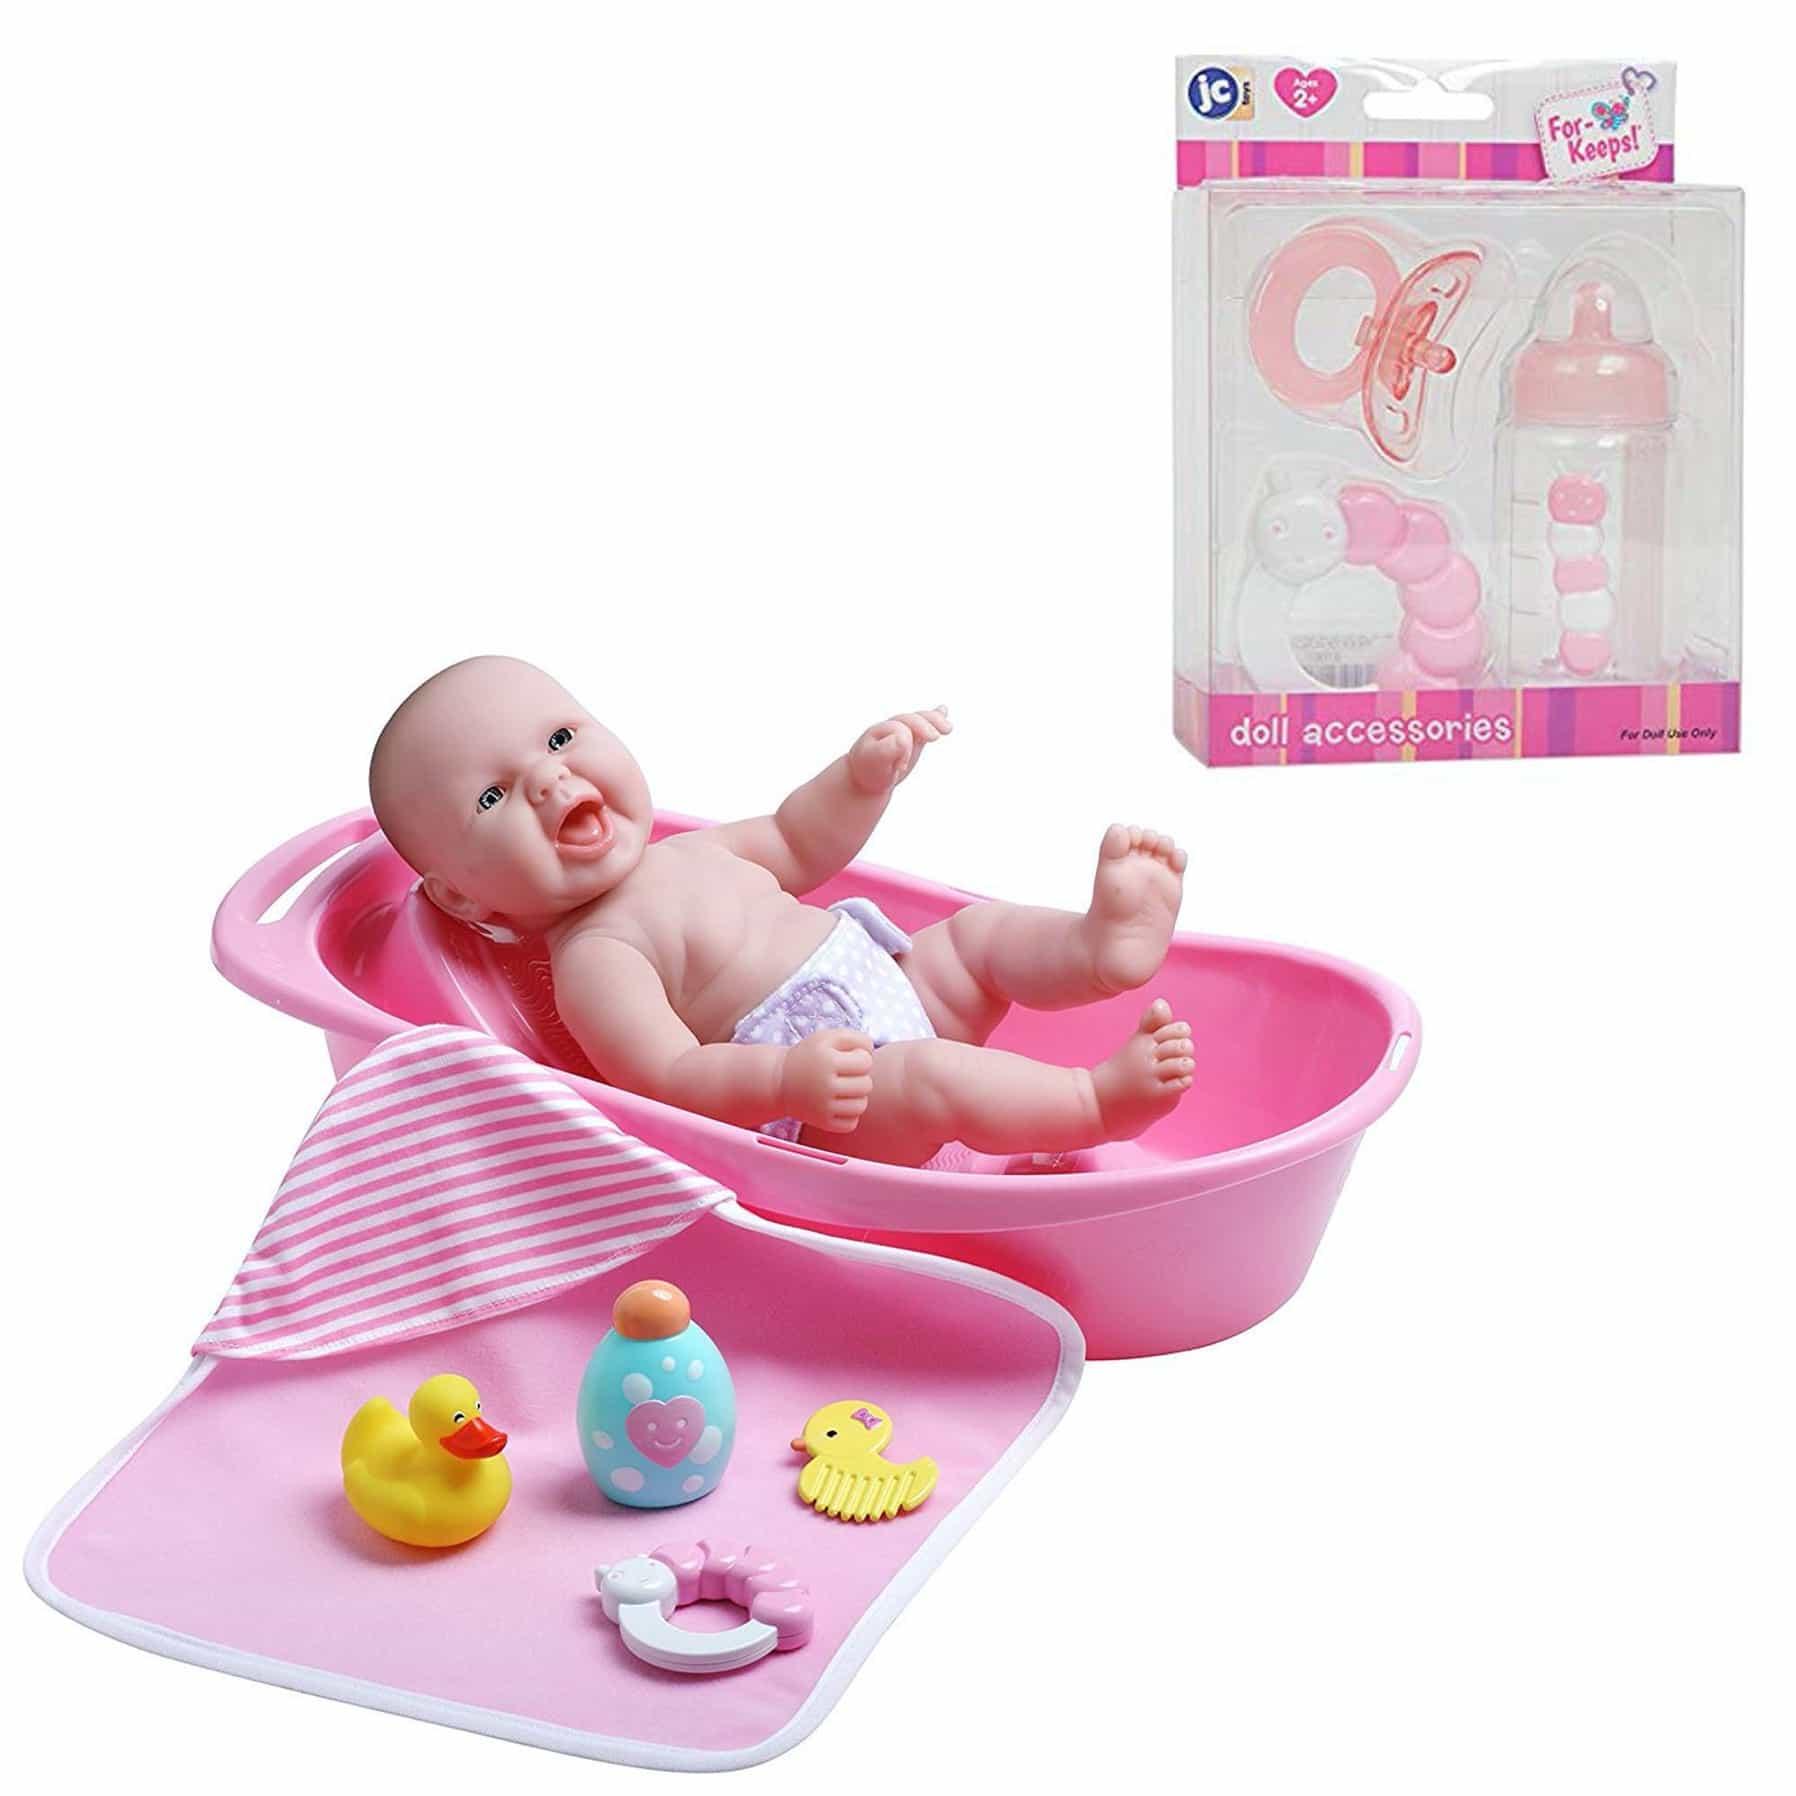 La Newborn Baby Doll Set + Accessories (Styles May Vary)